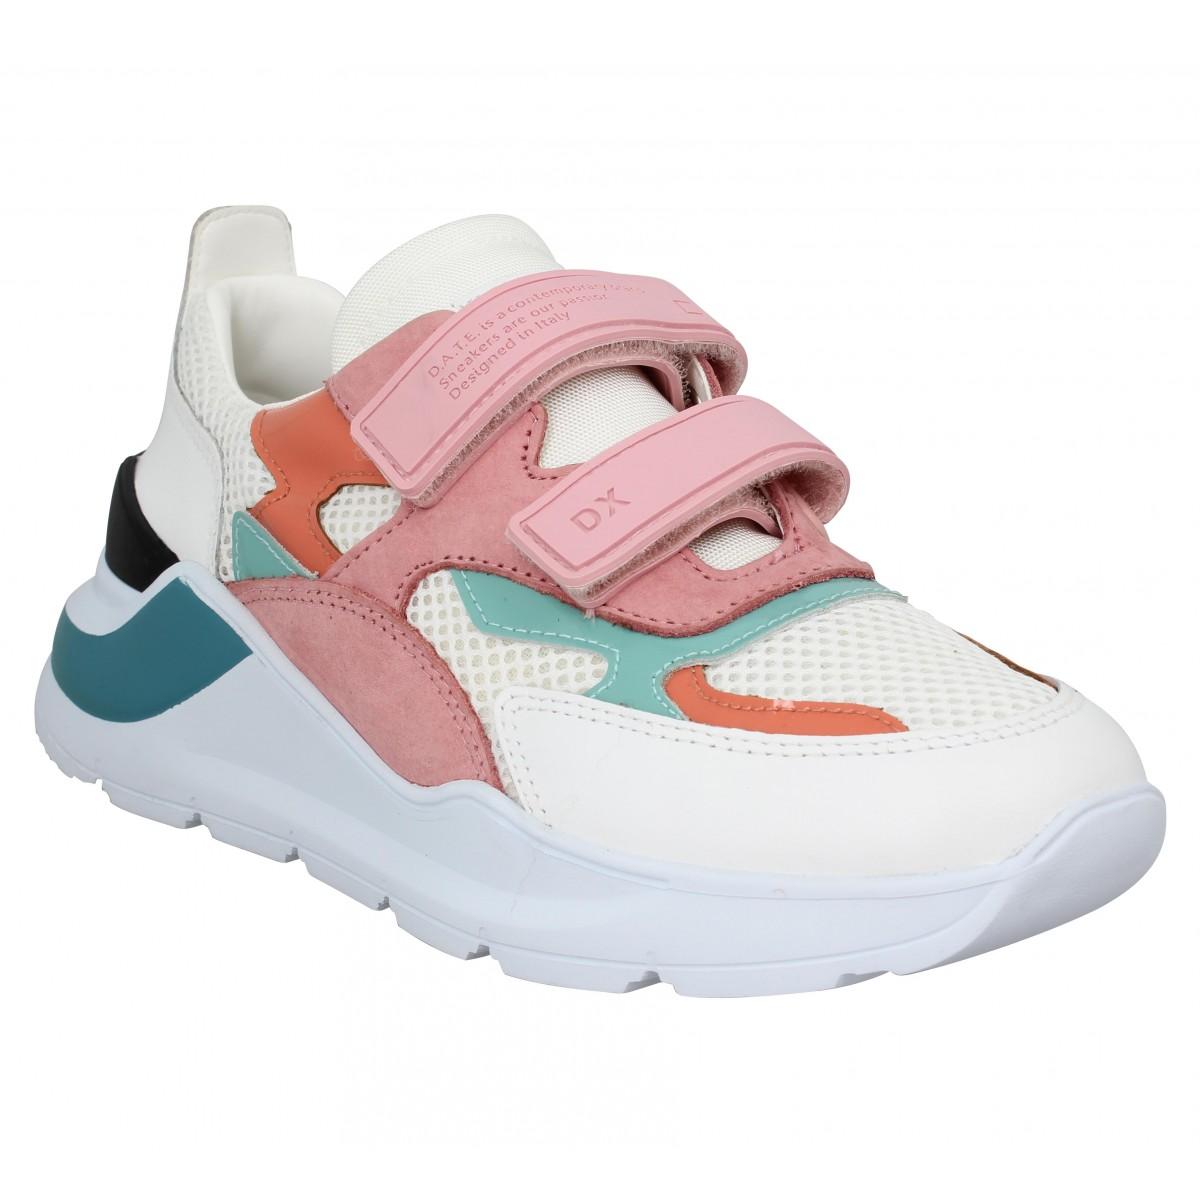 D.A.T.E Marque Date Sneakers Fuga Strap...